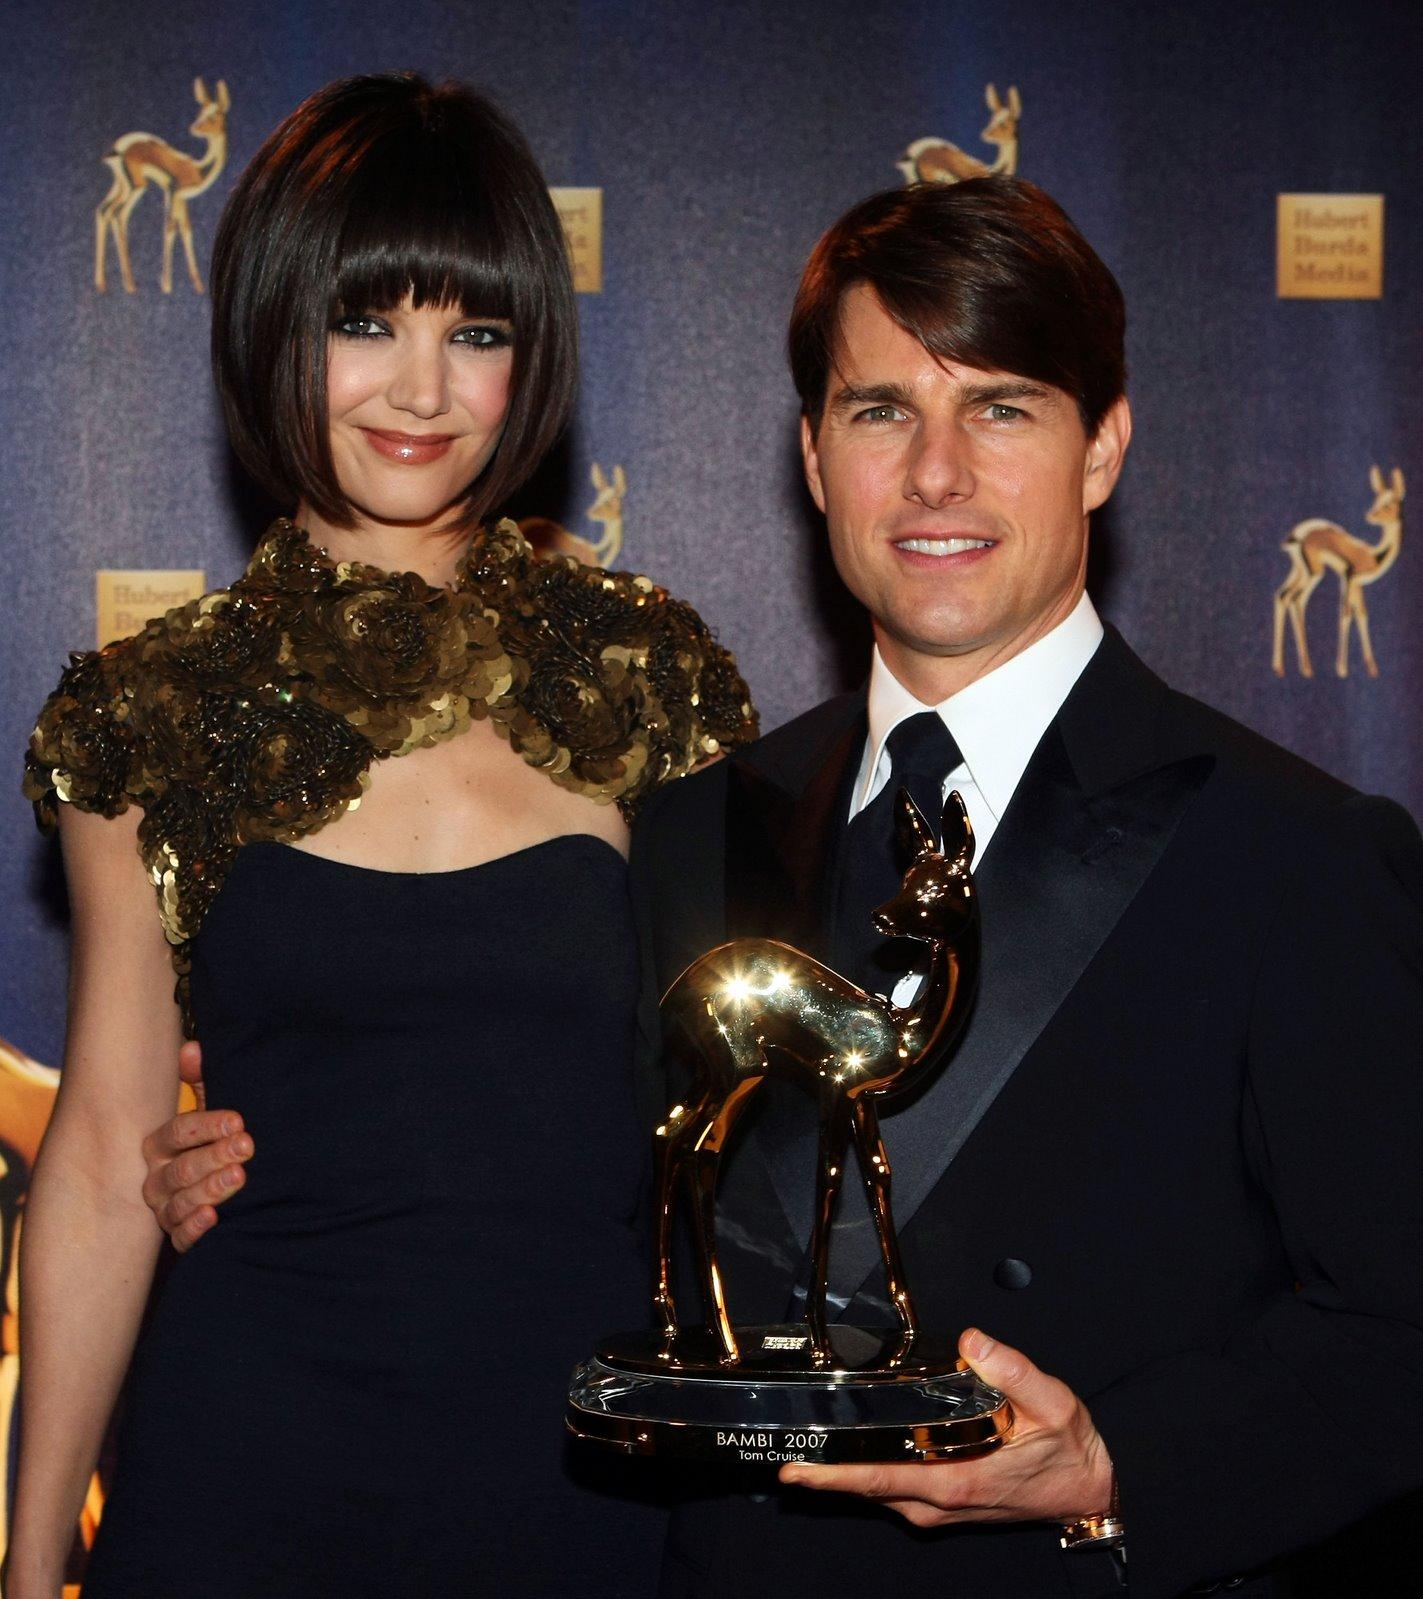 http://3.bp.blogspot.com/_2J0zHNa4gDo/R1Blq8TNazI/AAAAAAAABUw/u3yJlJF-MpI/s1600-R/70182_Celebutopia-Tom_Cruise_and_Katie_Holmes-Annual_Bambi_Awards_2007_in_Duesseldorf-03_123_934lo.jpg